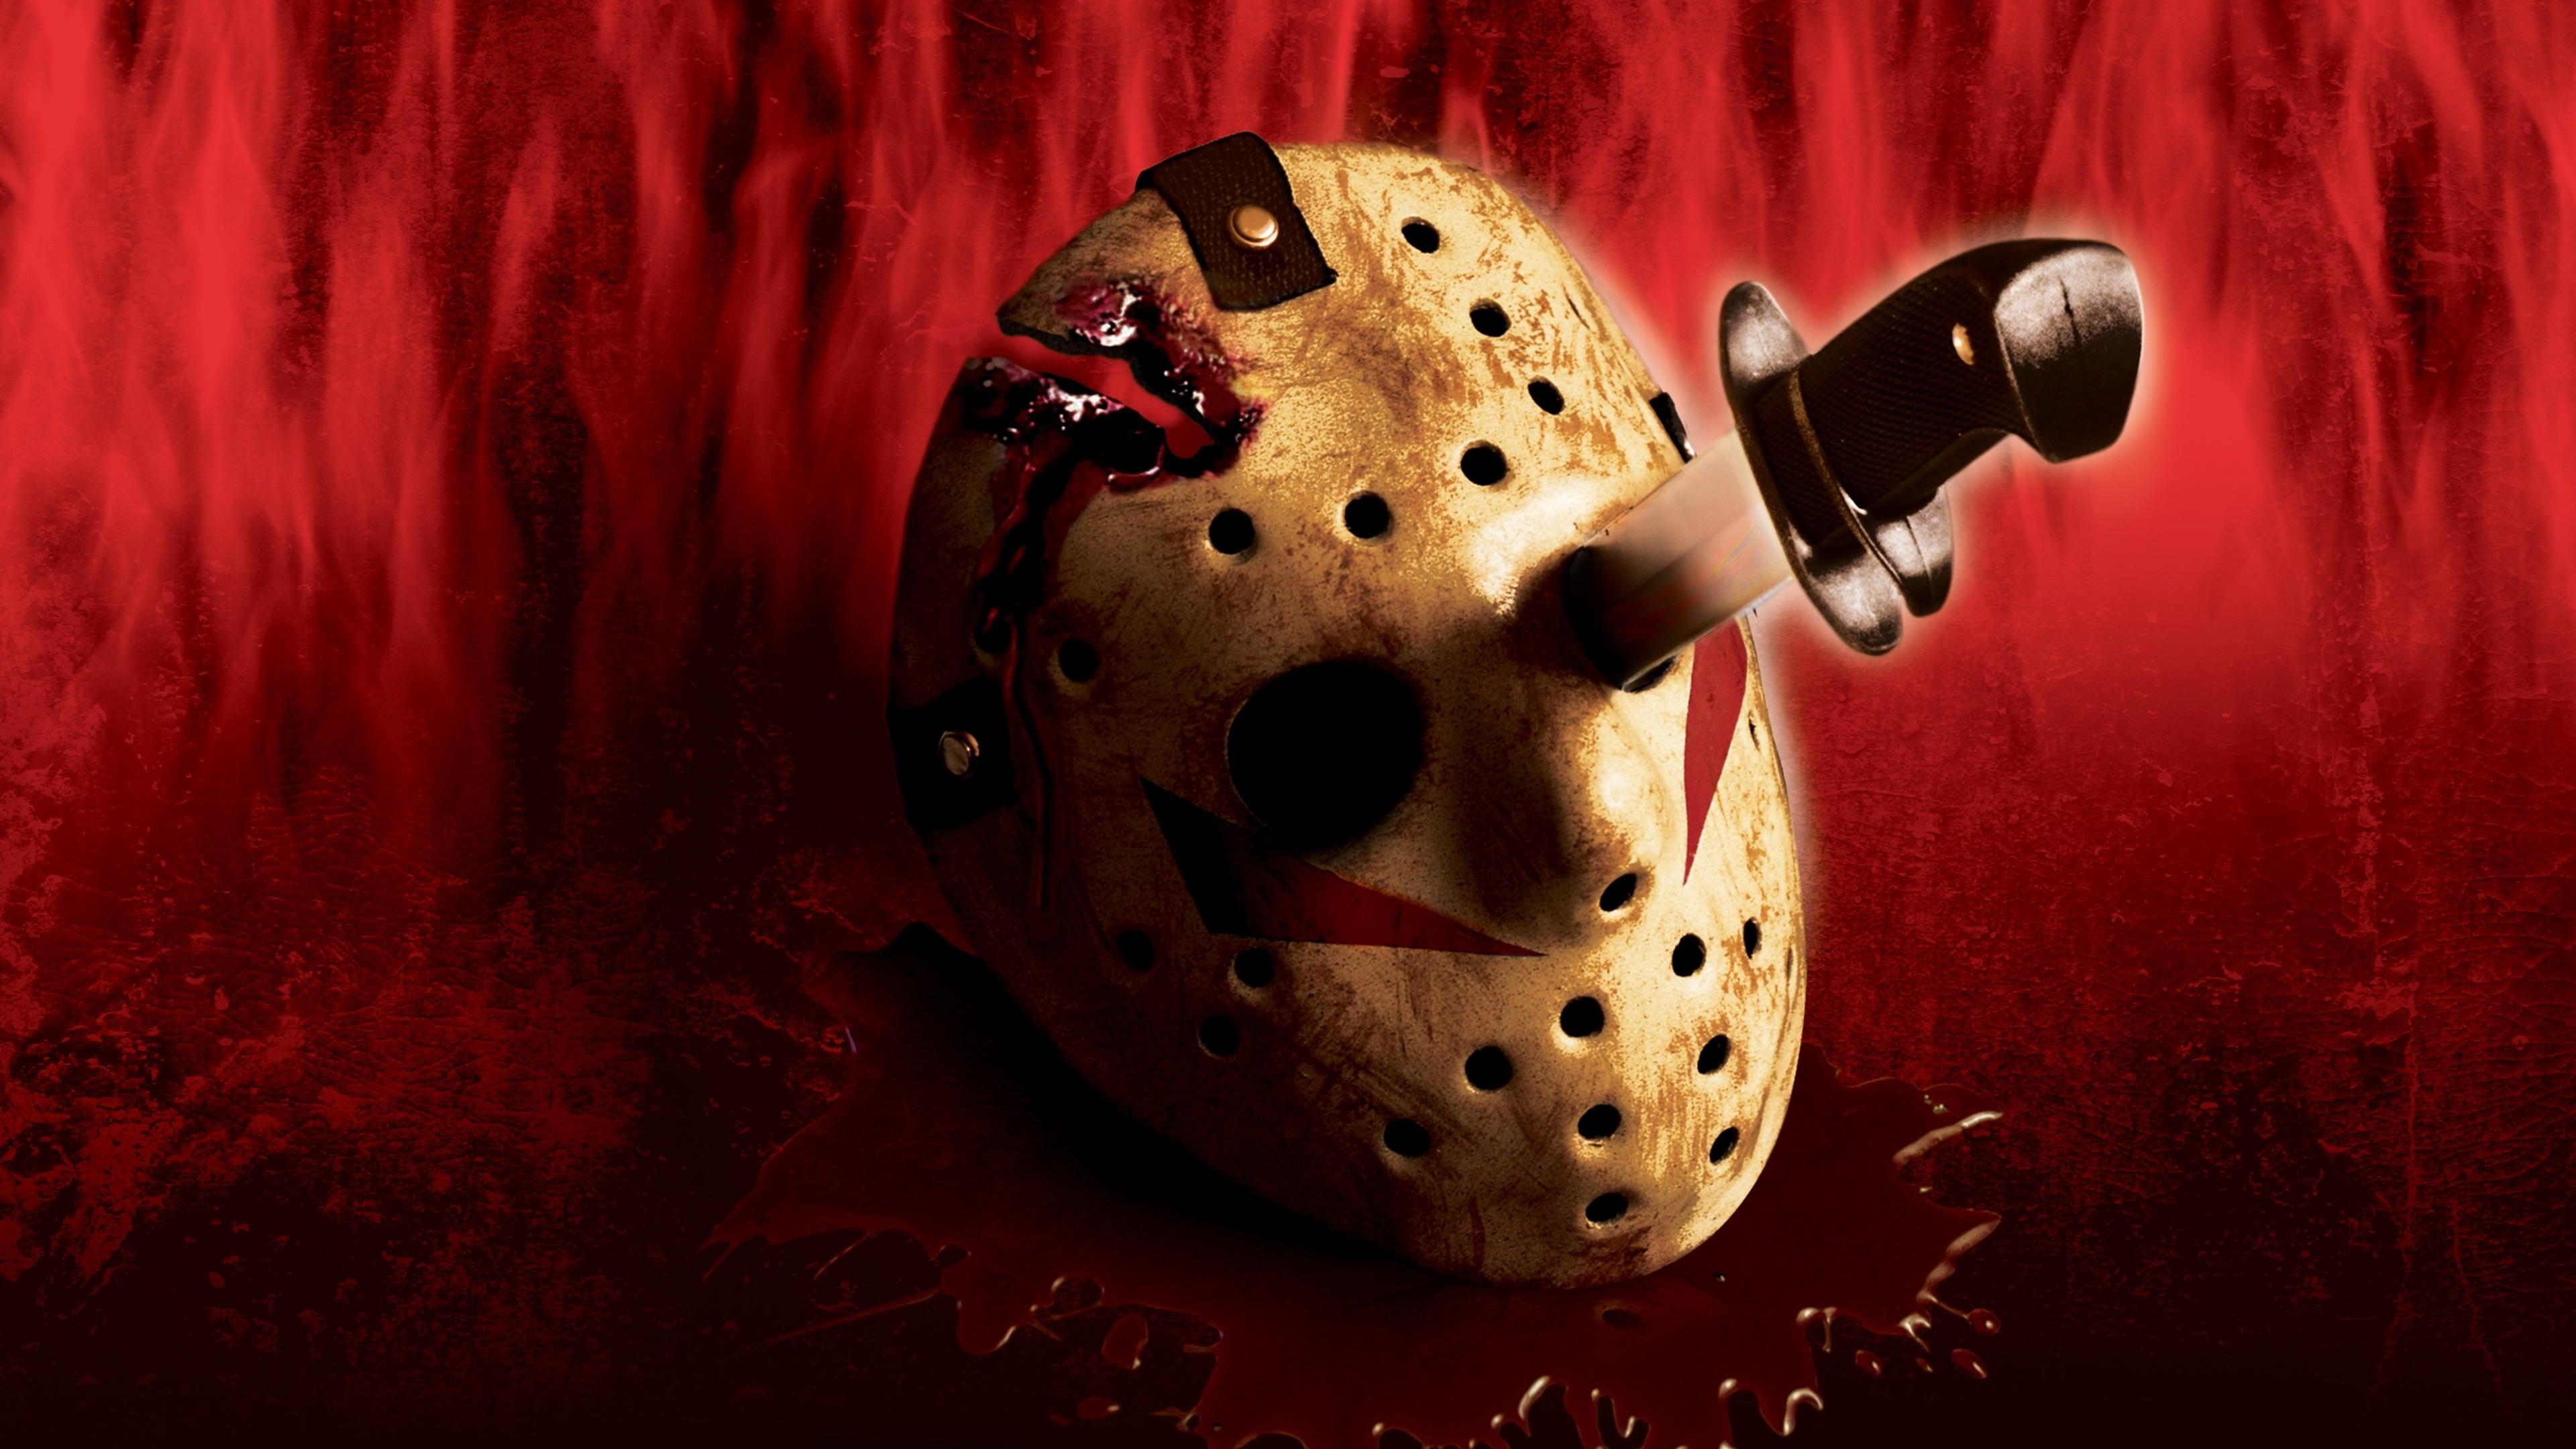 Jason Friday The 13th Fictional Character Horror Movies Hockey Mask Knife 3840x2160